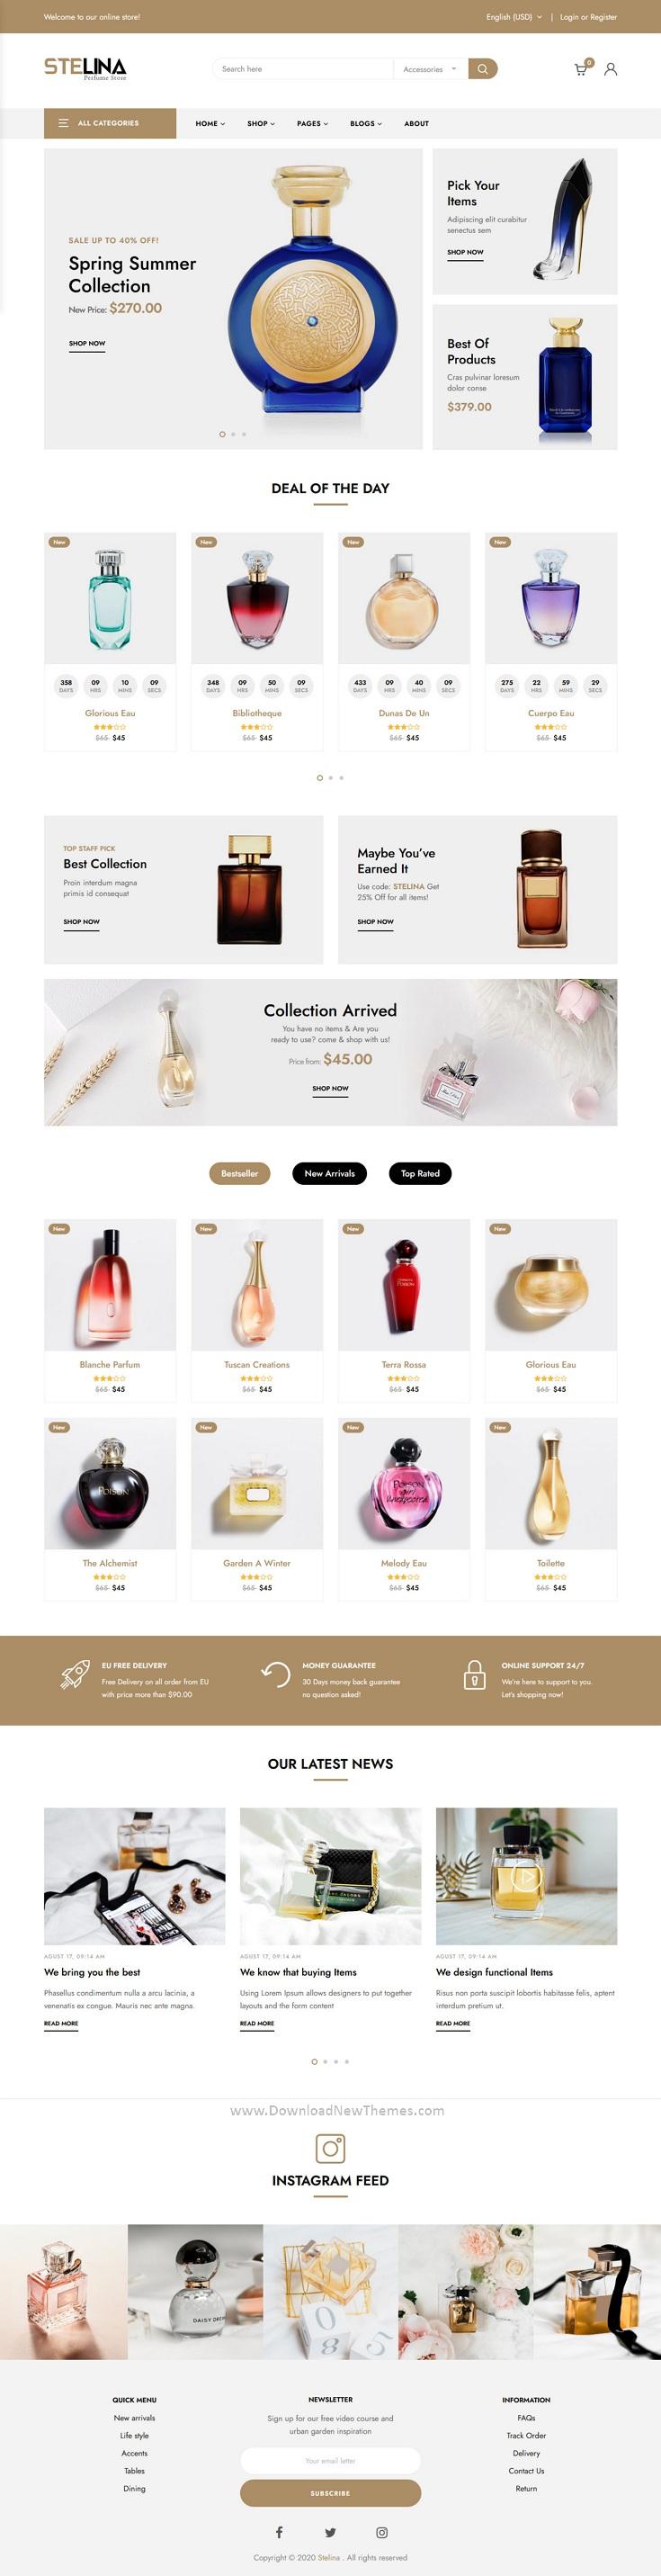 Perfume Store HTML Template